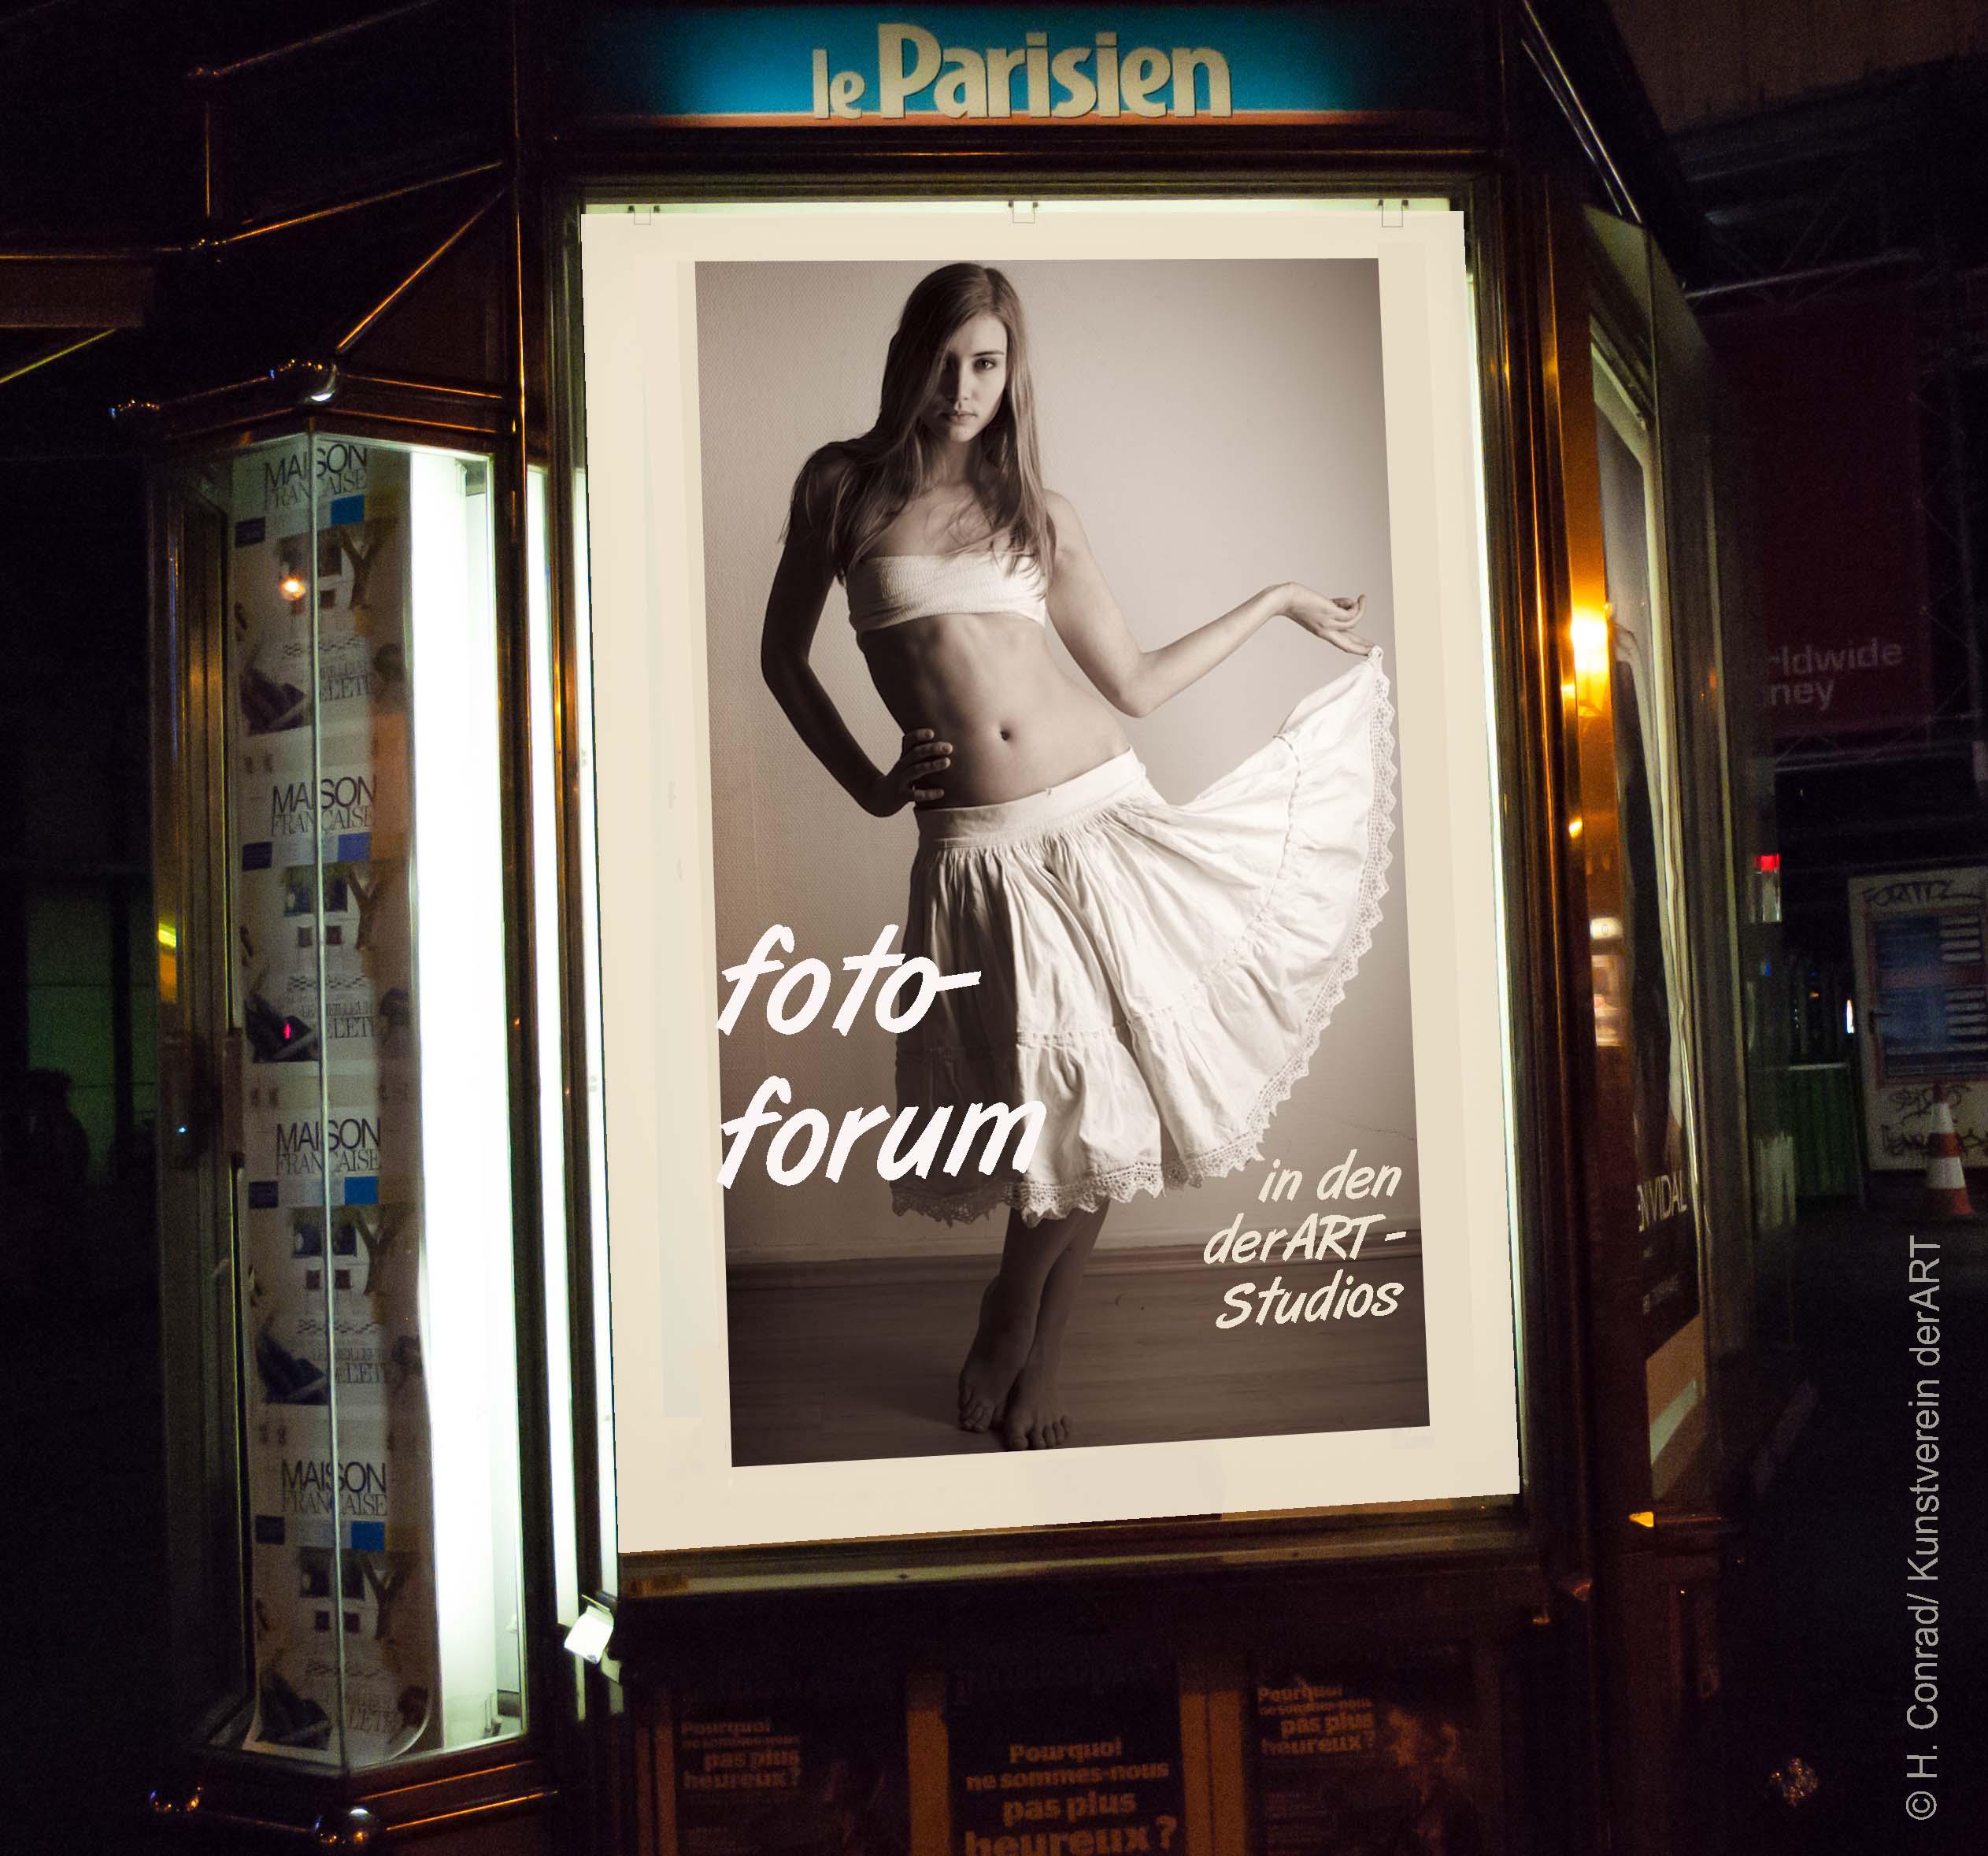 das 39. foto-forum